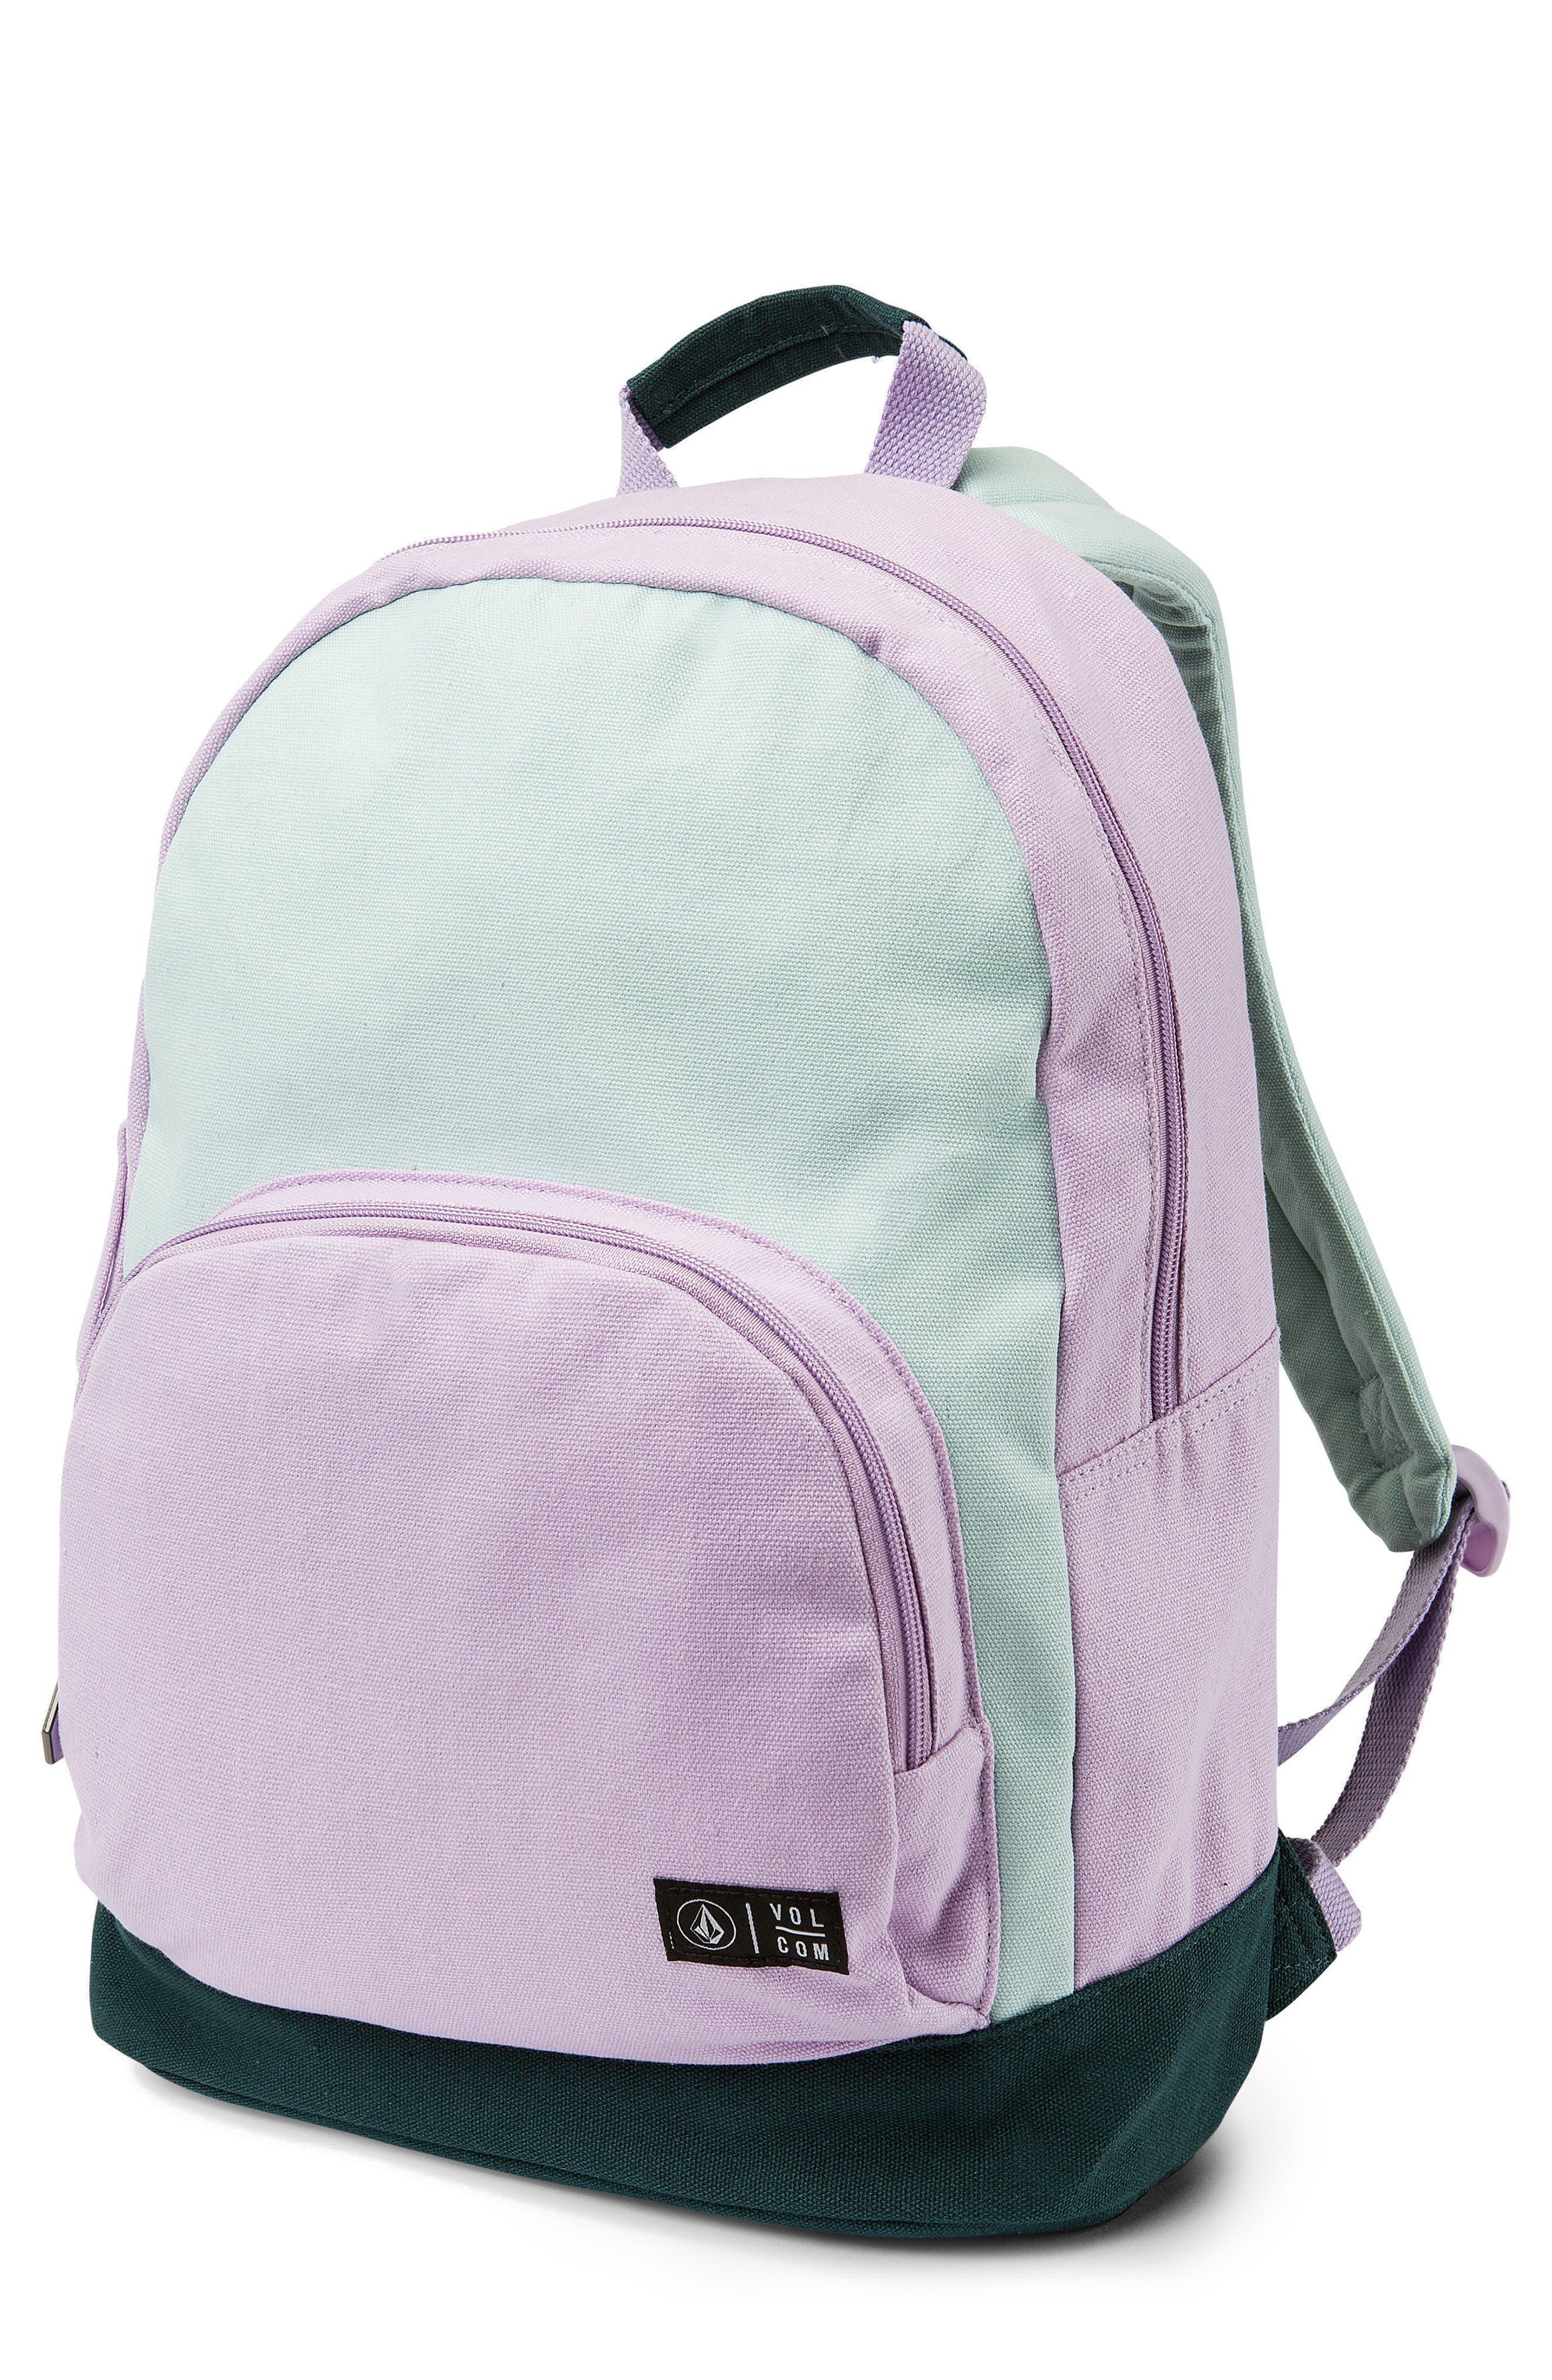 Schoolyard Canvas Backpack,                         Main,                         color, Light Blue